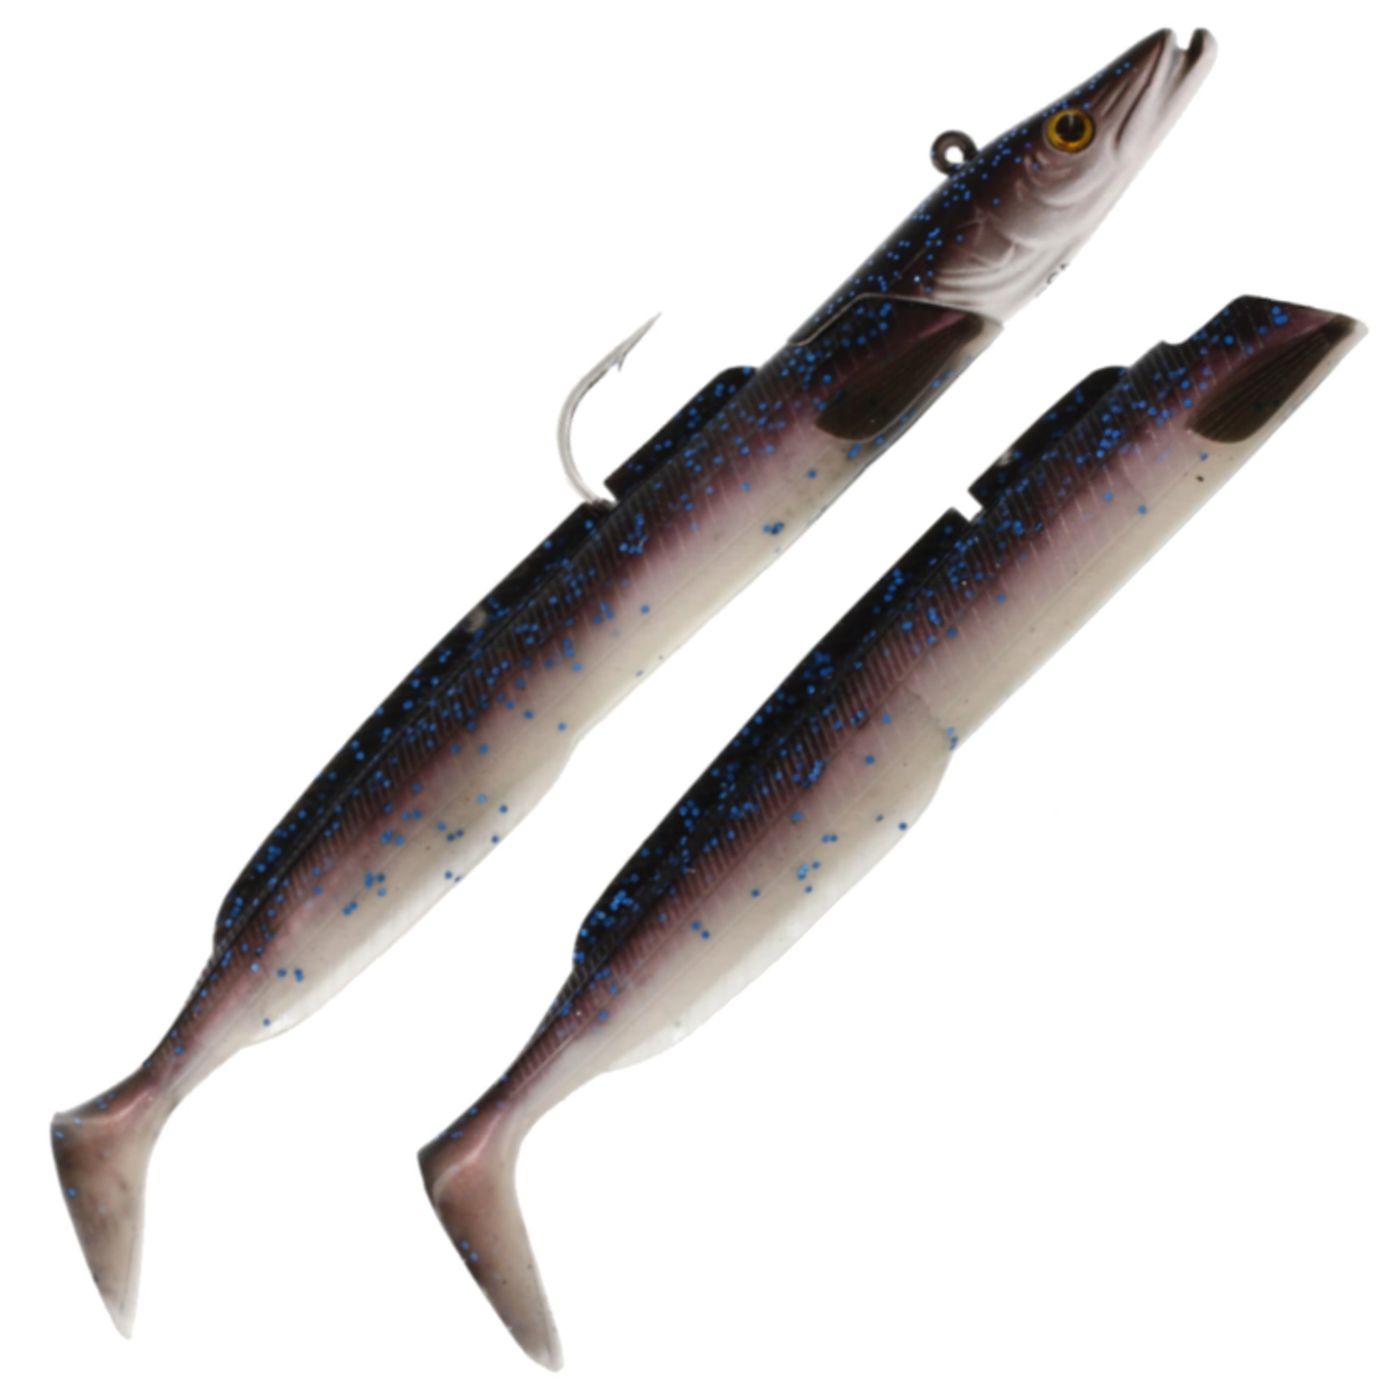 Westin Sandy Andy 10 CM 12 meeresshad, g-Caoutchouc de poisson, meeresshad, 12 mers Appât, Morue Appât cdaece